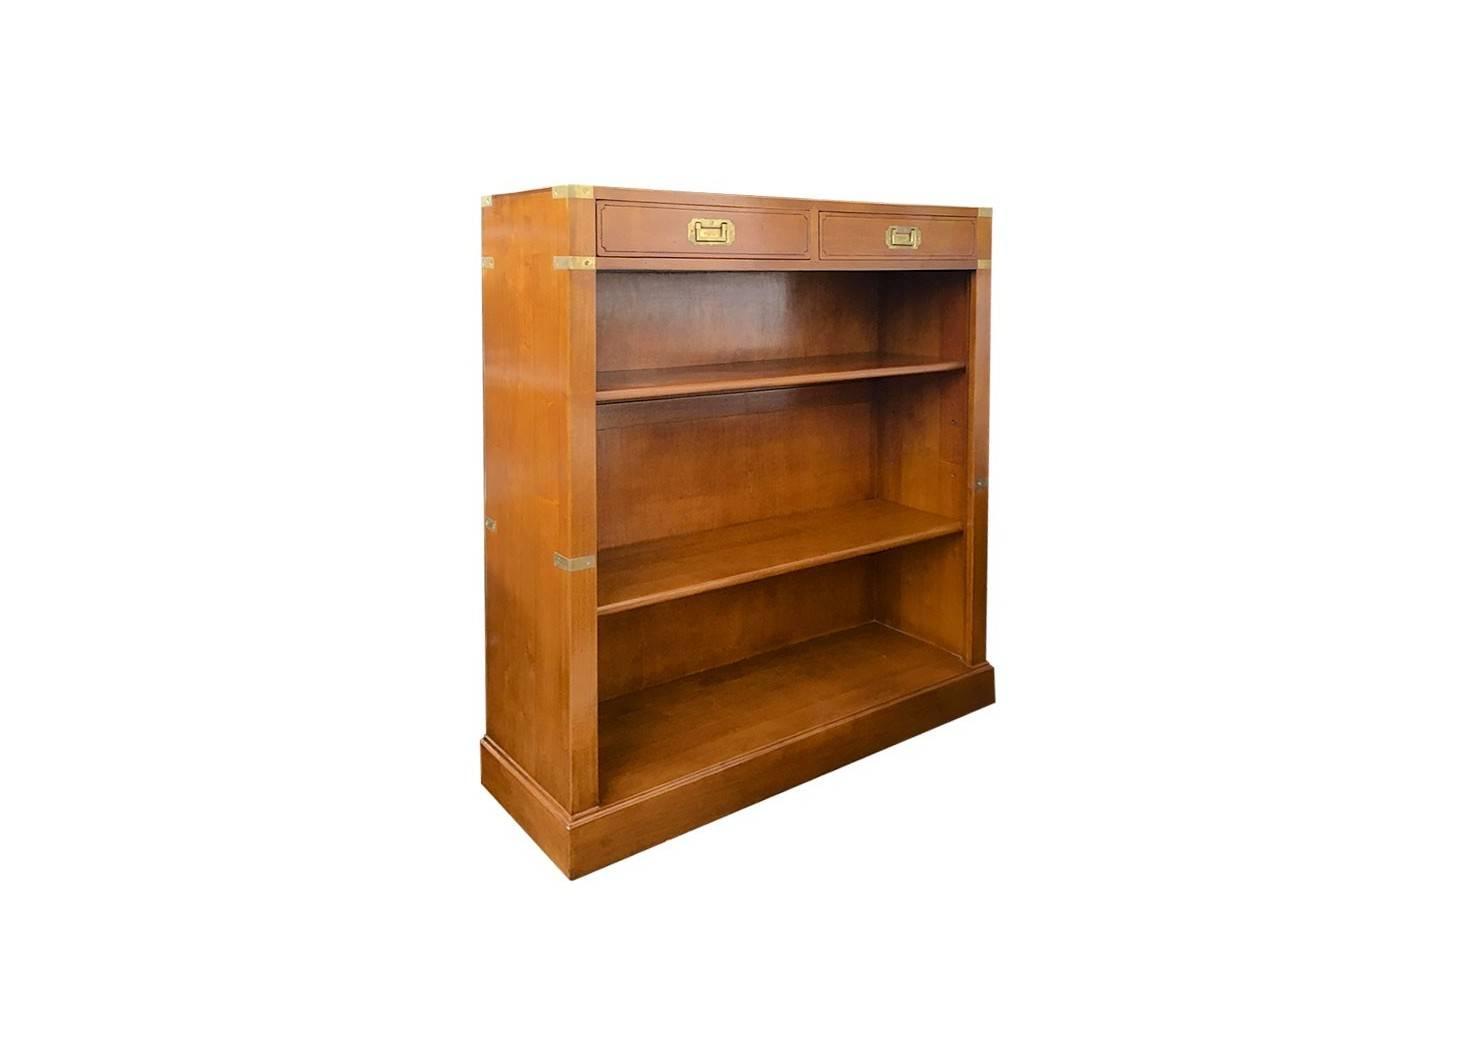 Low bookshelf in marine style